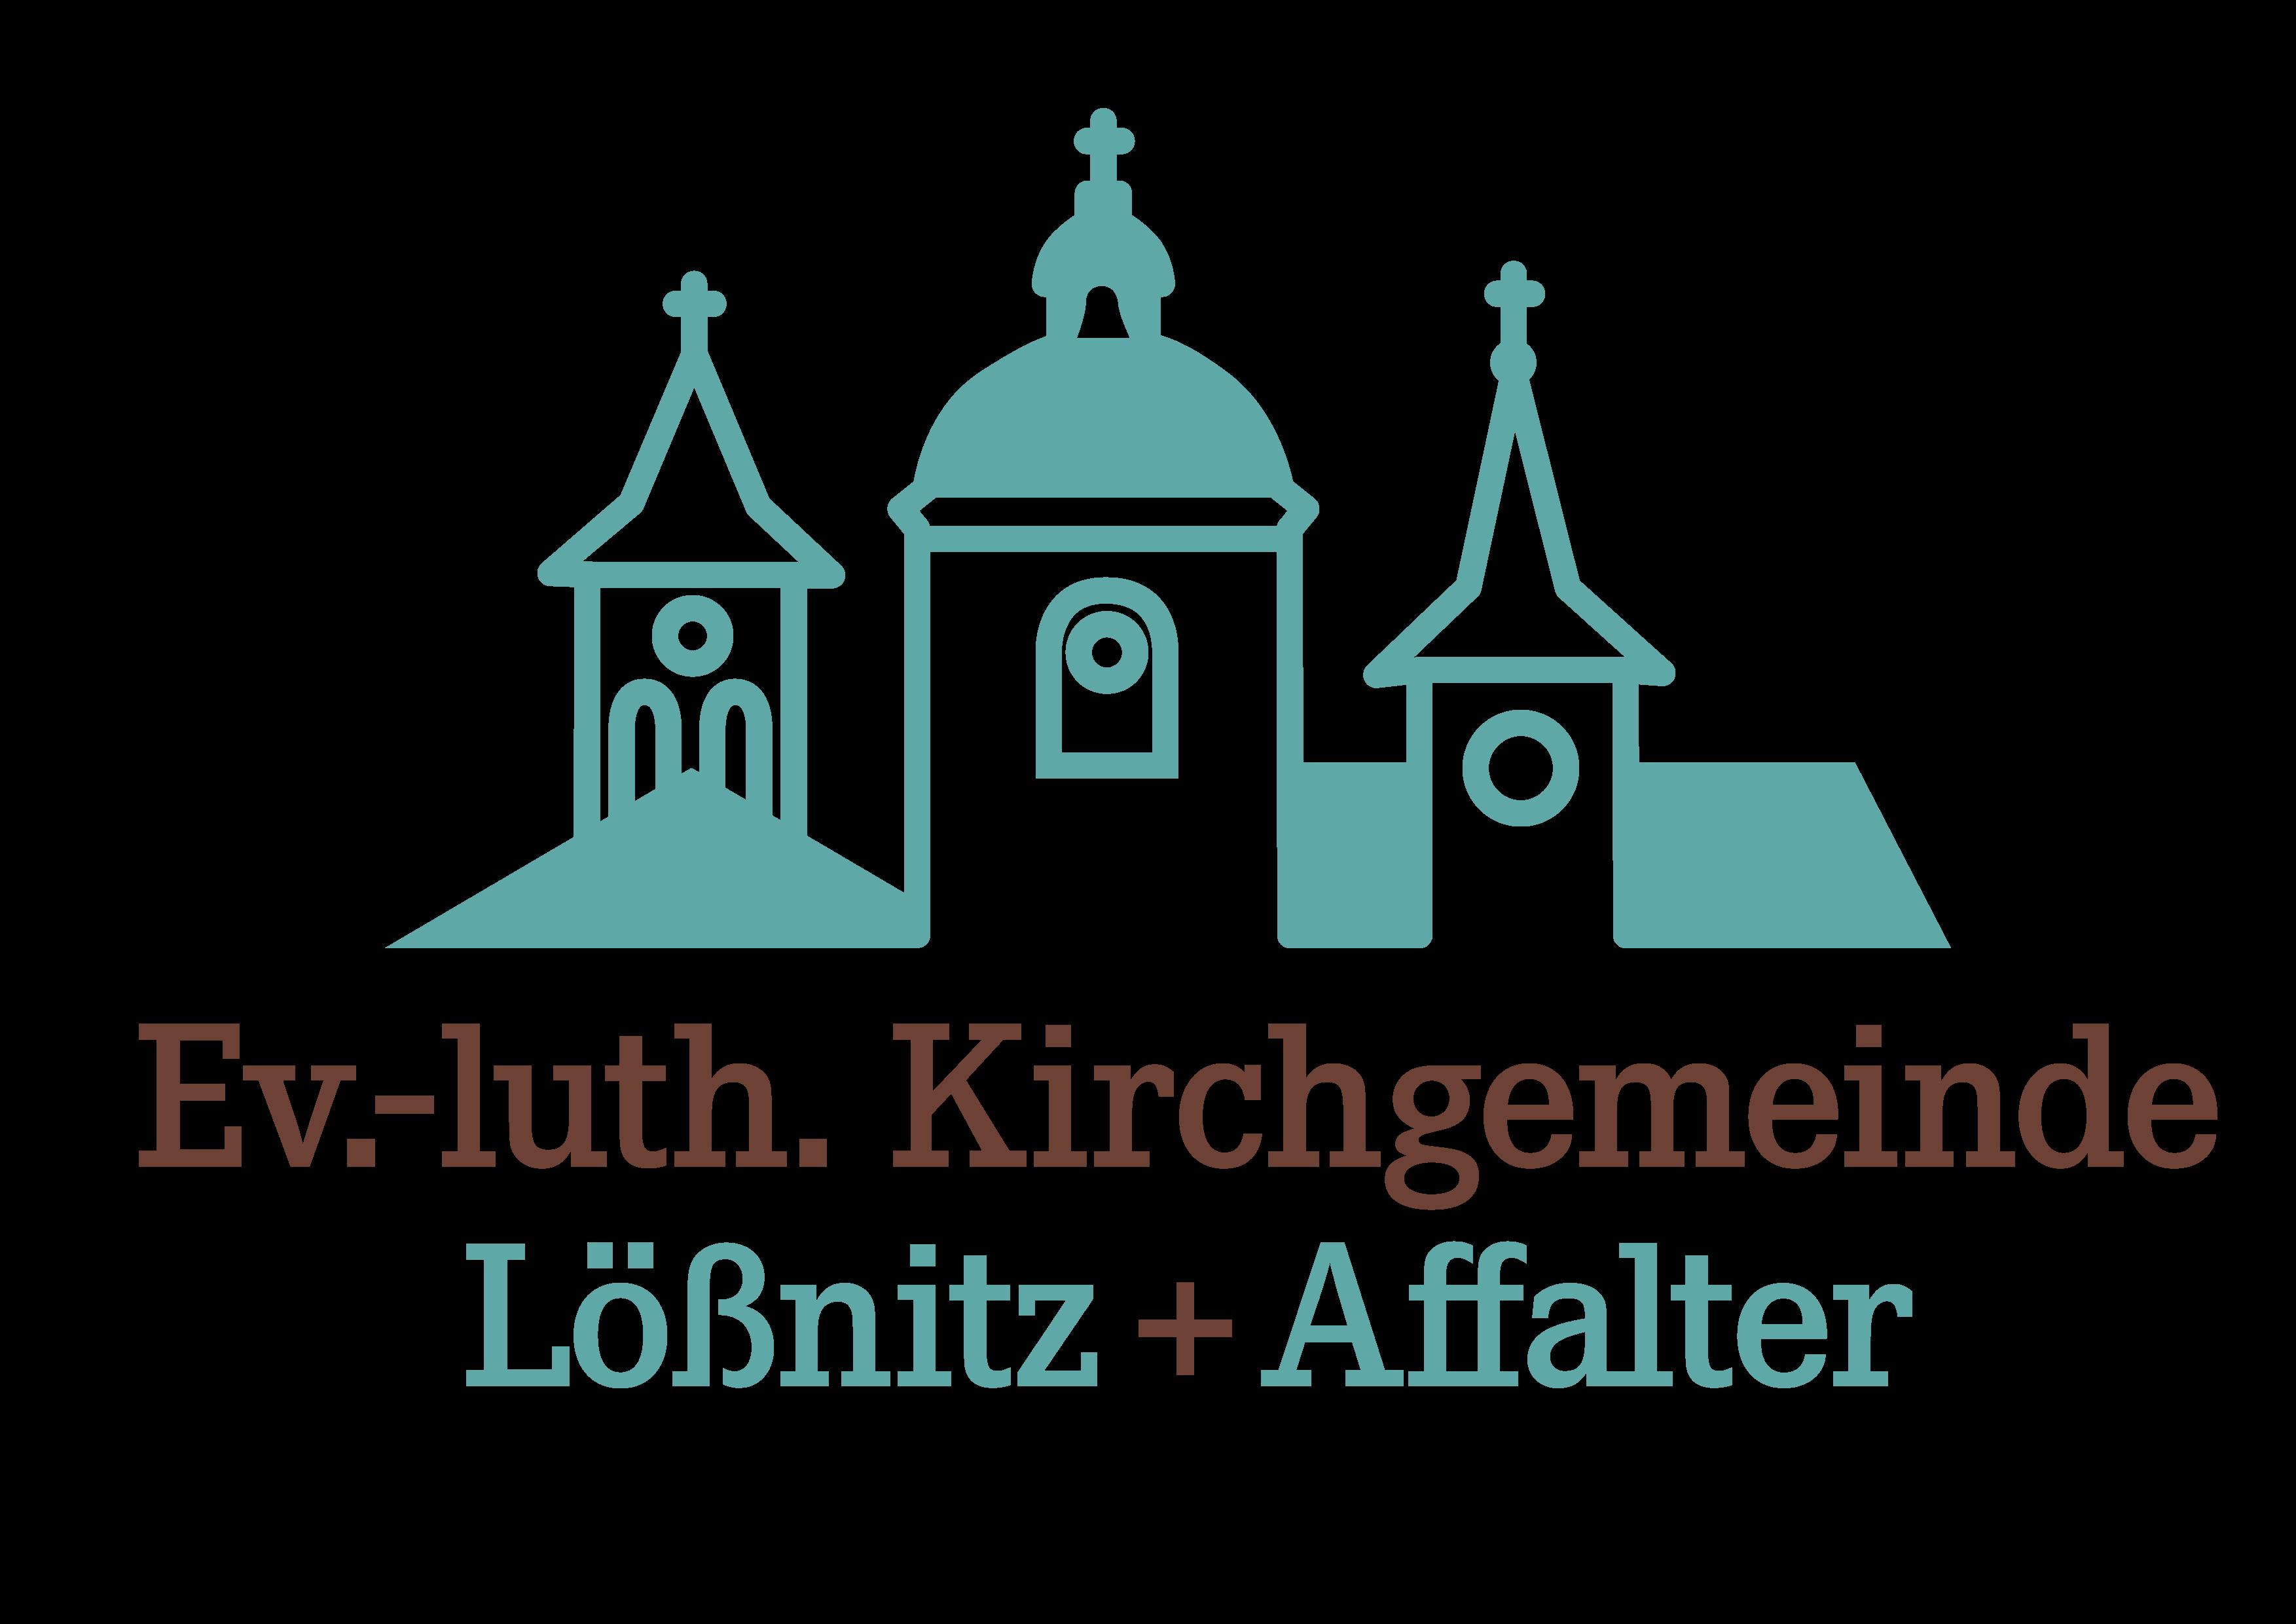 Ev.-luth. Kirchgemeinde Lößnitz-Affalter